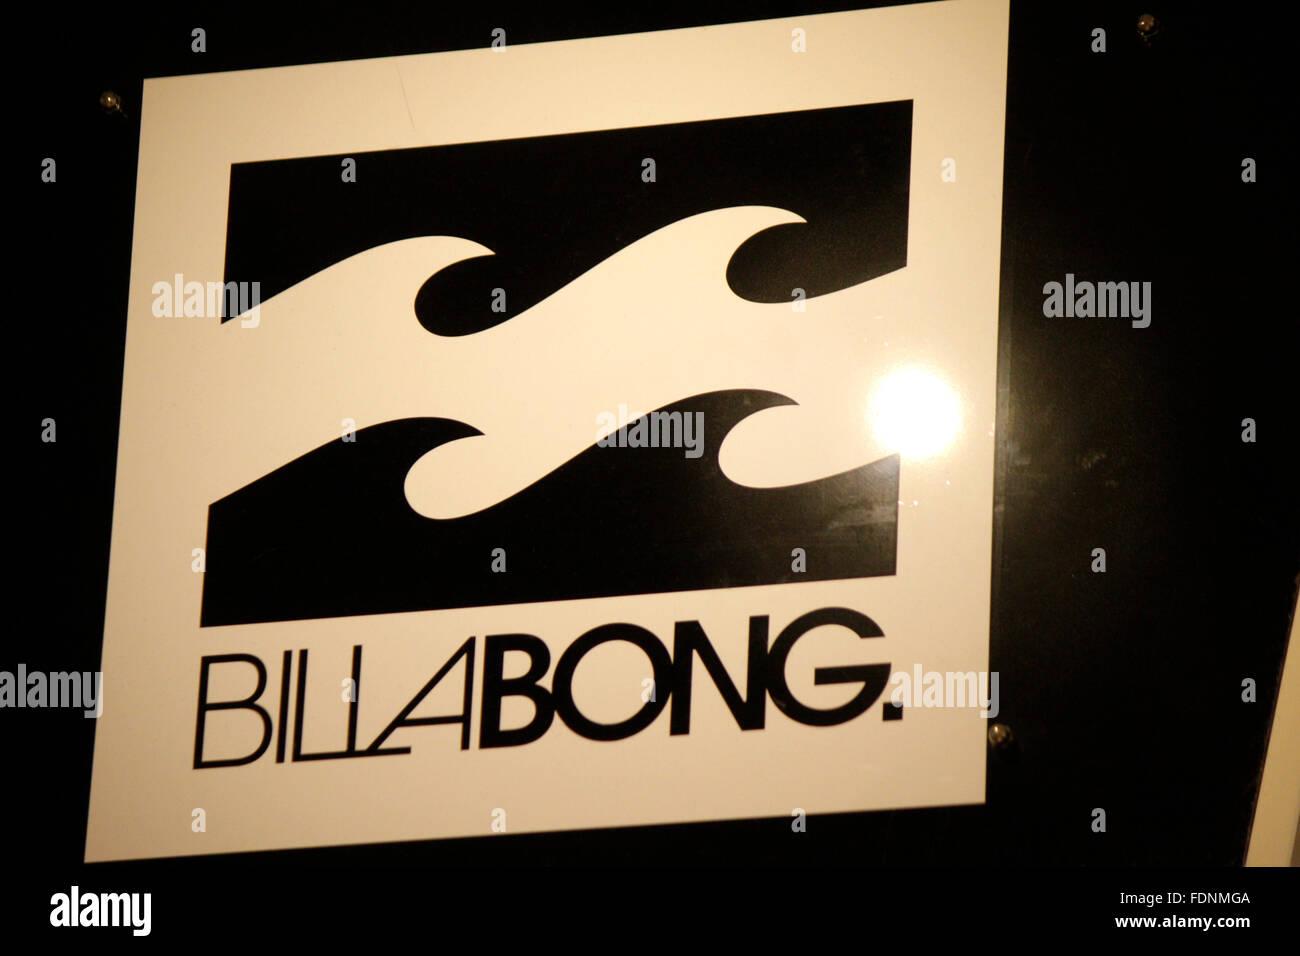 Markenname: 'Billabong', Berlin. - Stock Image